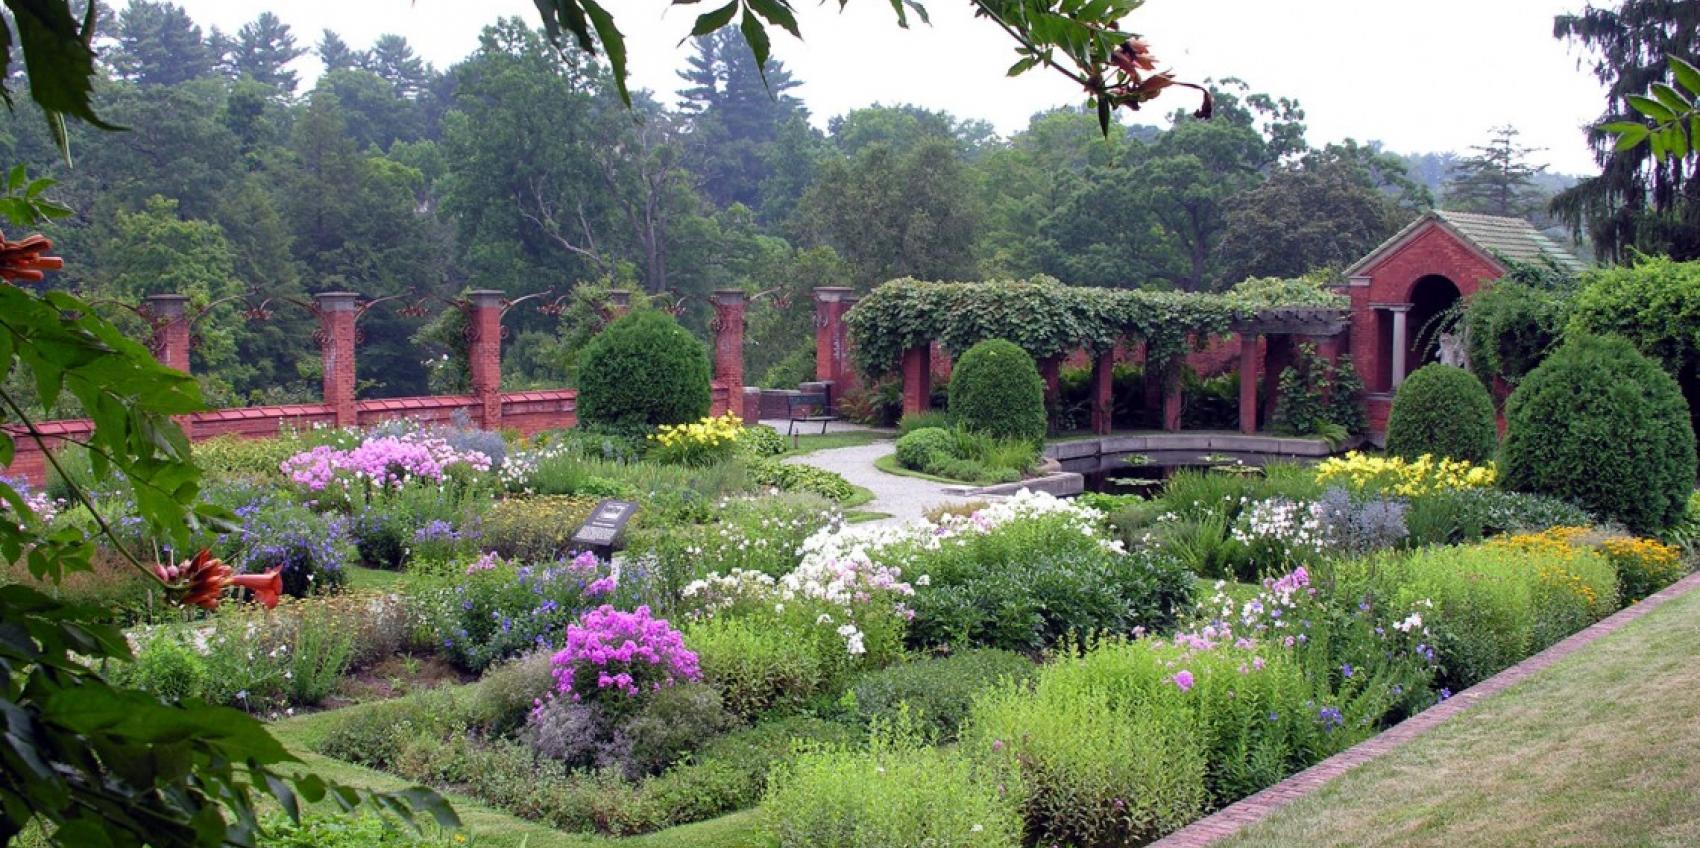 Roosevelt Vanderbilt National Historic Site American Public Gardens Association